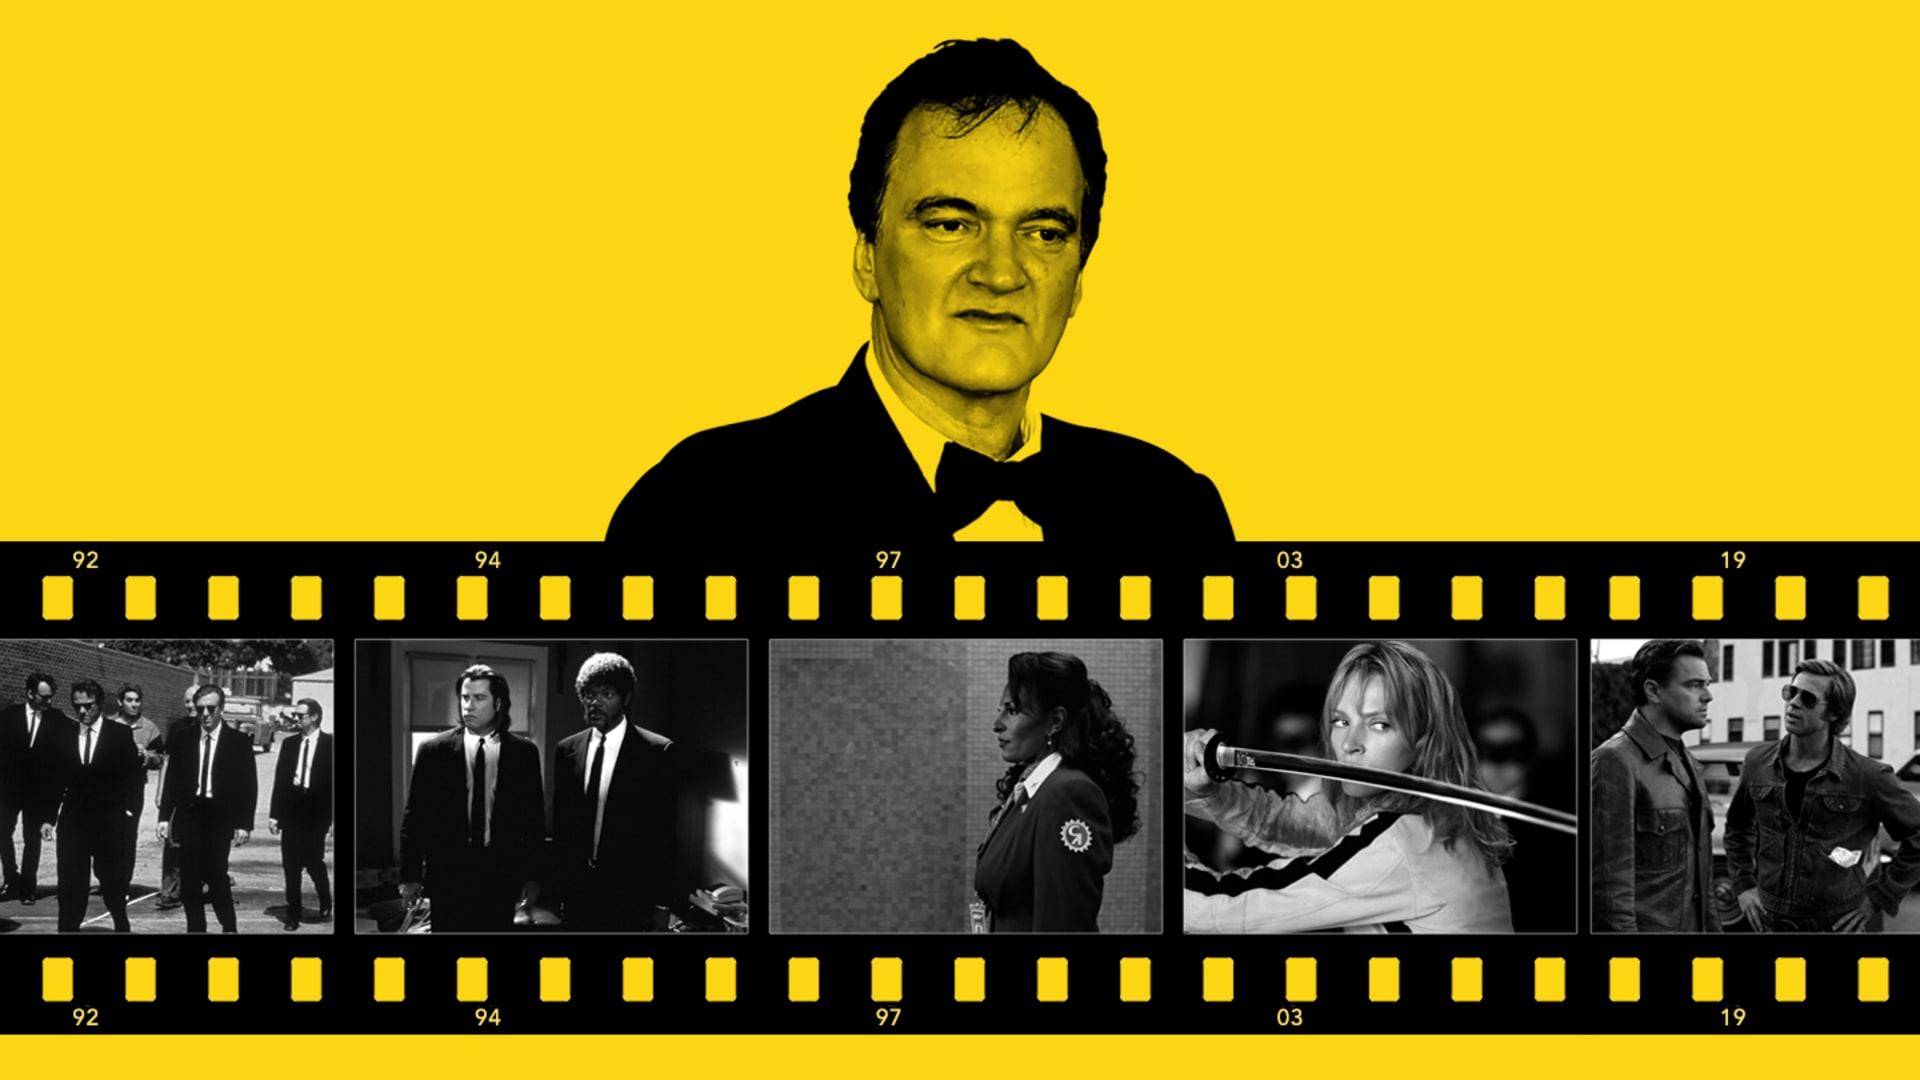 Quentin Tarantino Movies Ranked